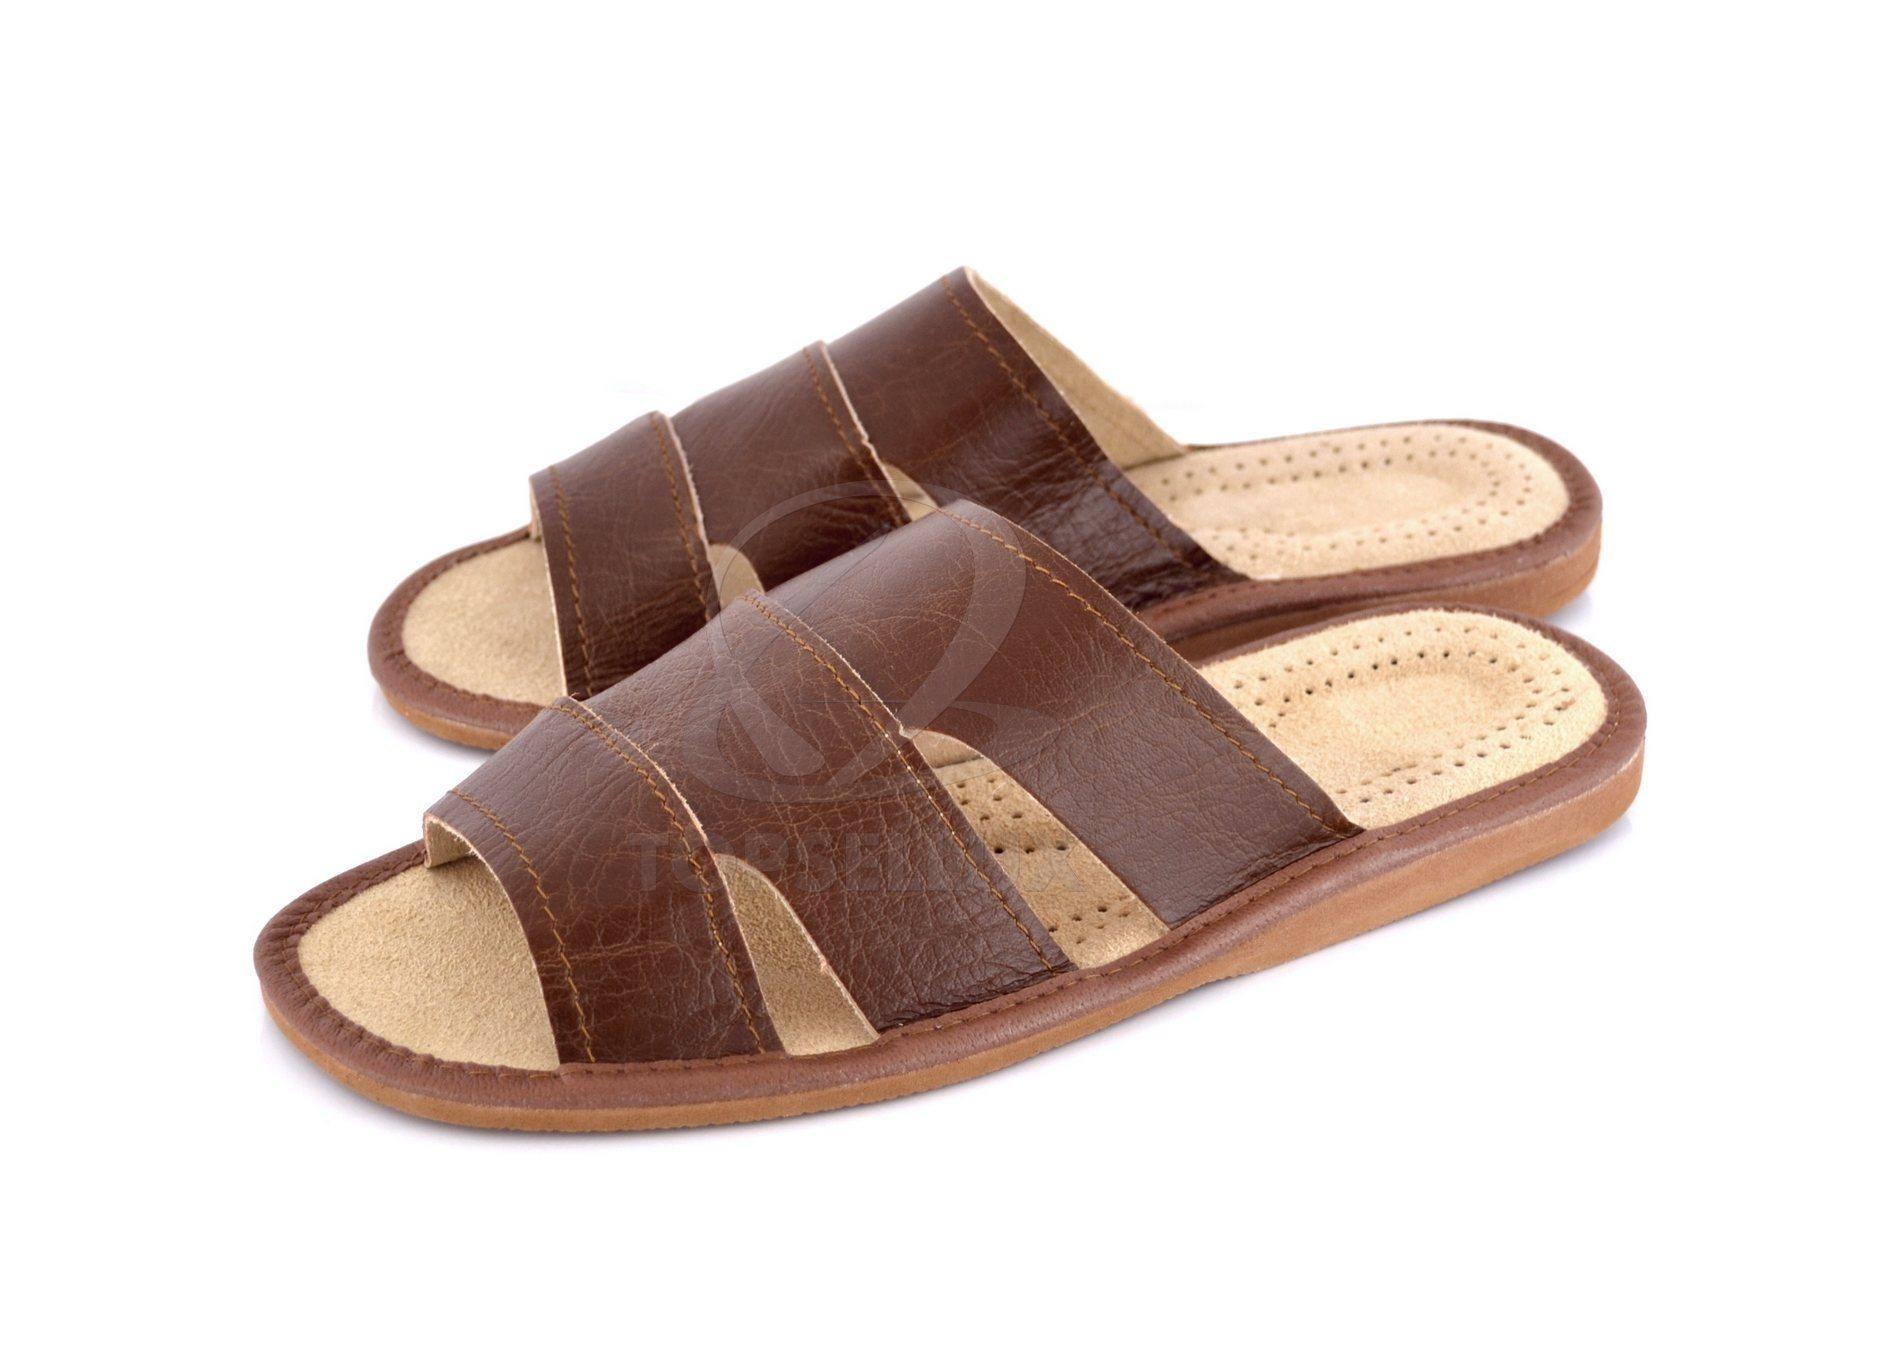 242cd00fbc2 Nya Present tofflor i mjukt läder herr inneskor bruna herr Sandaler skor  Stl 43 ...